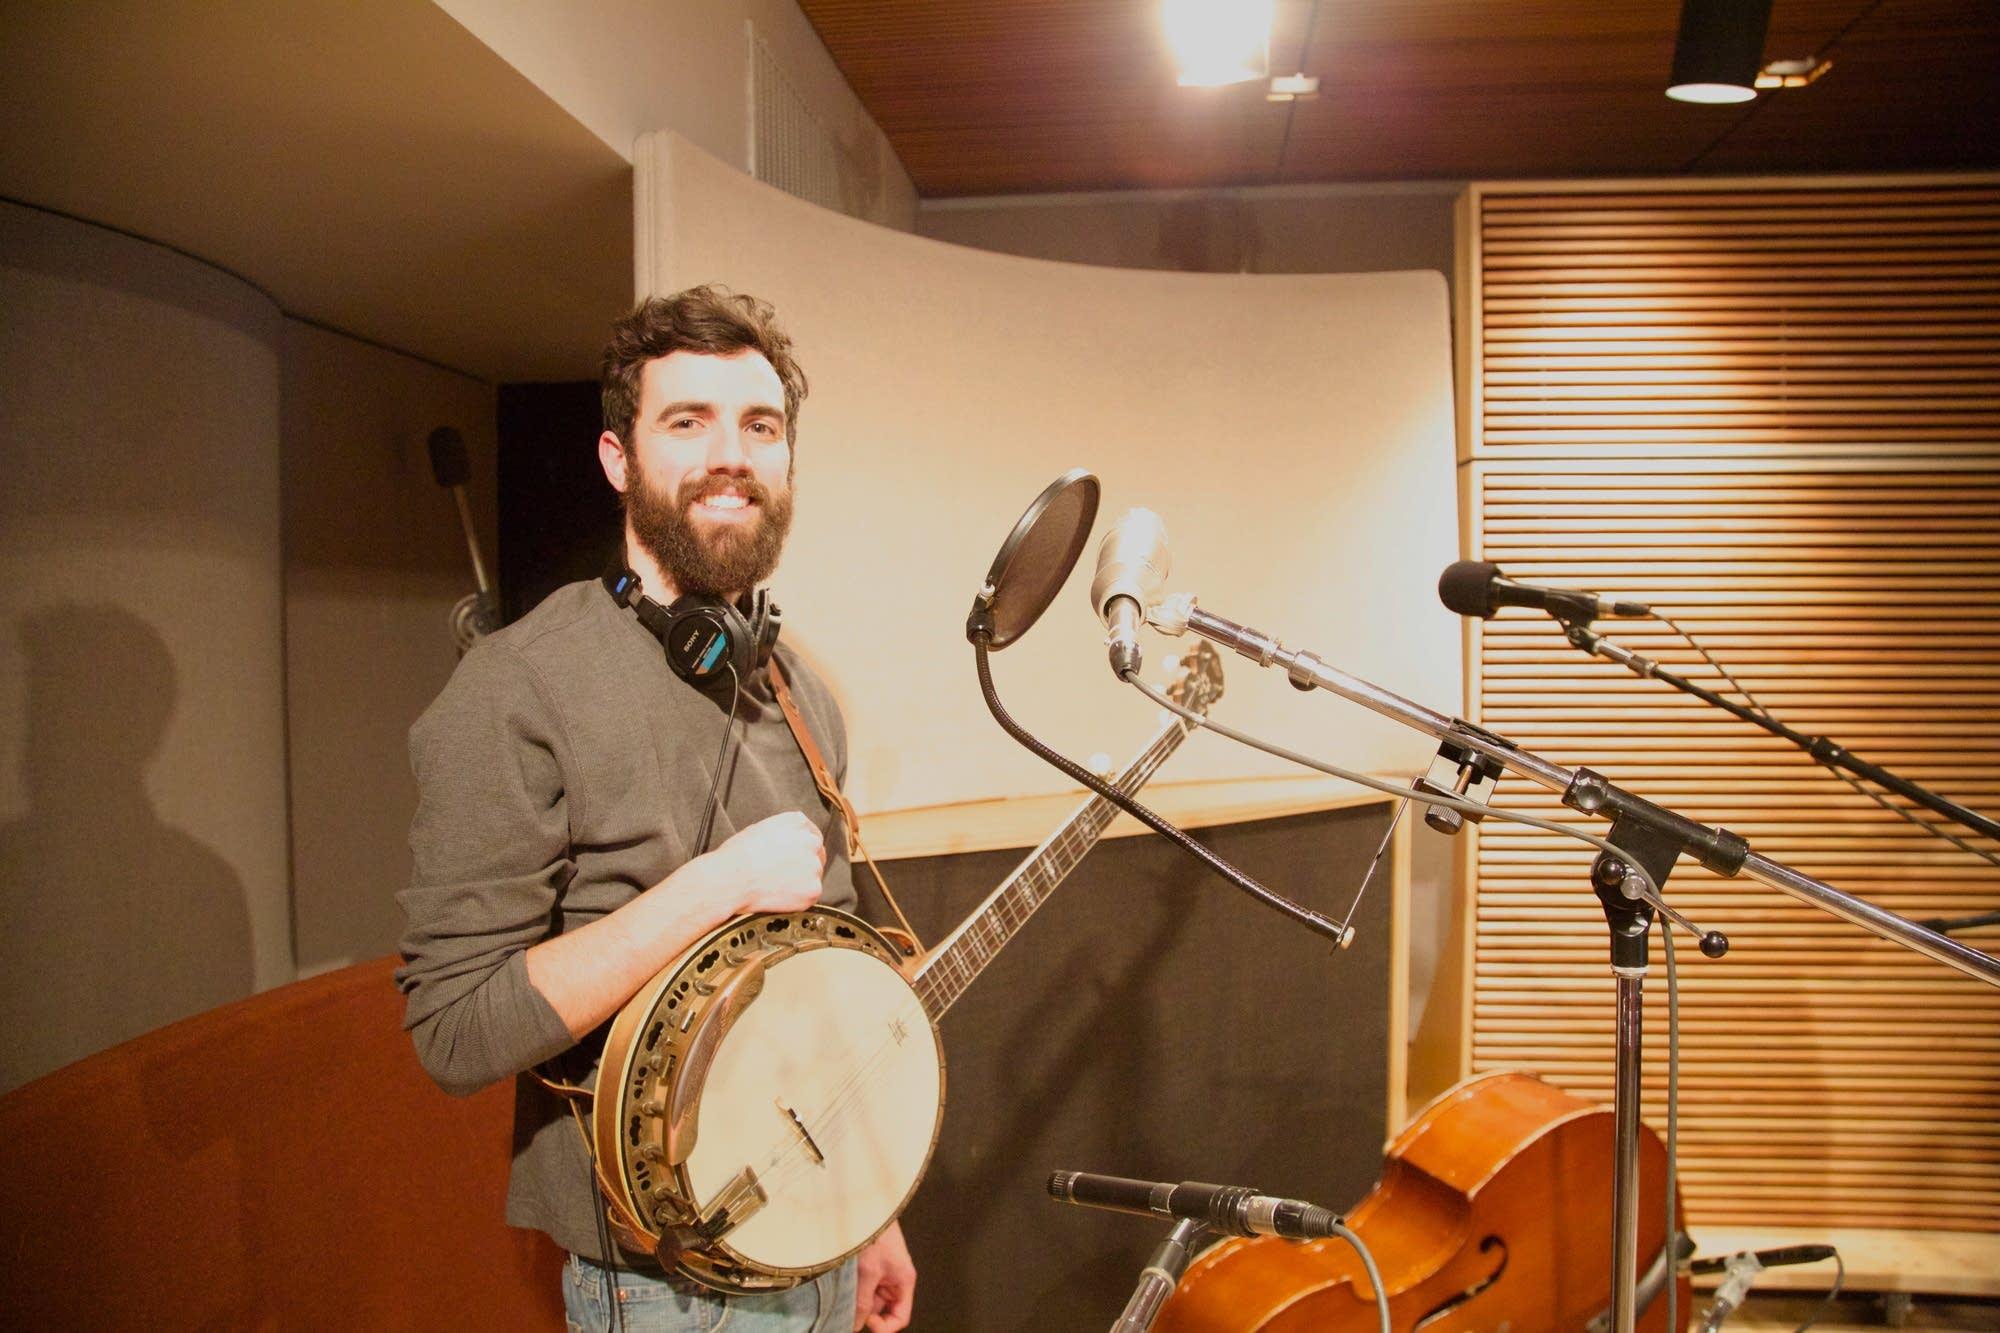 The Last Revel Perform In The Radio Heartland Studio The